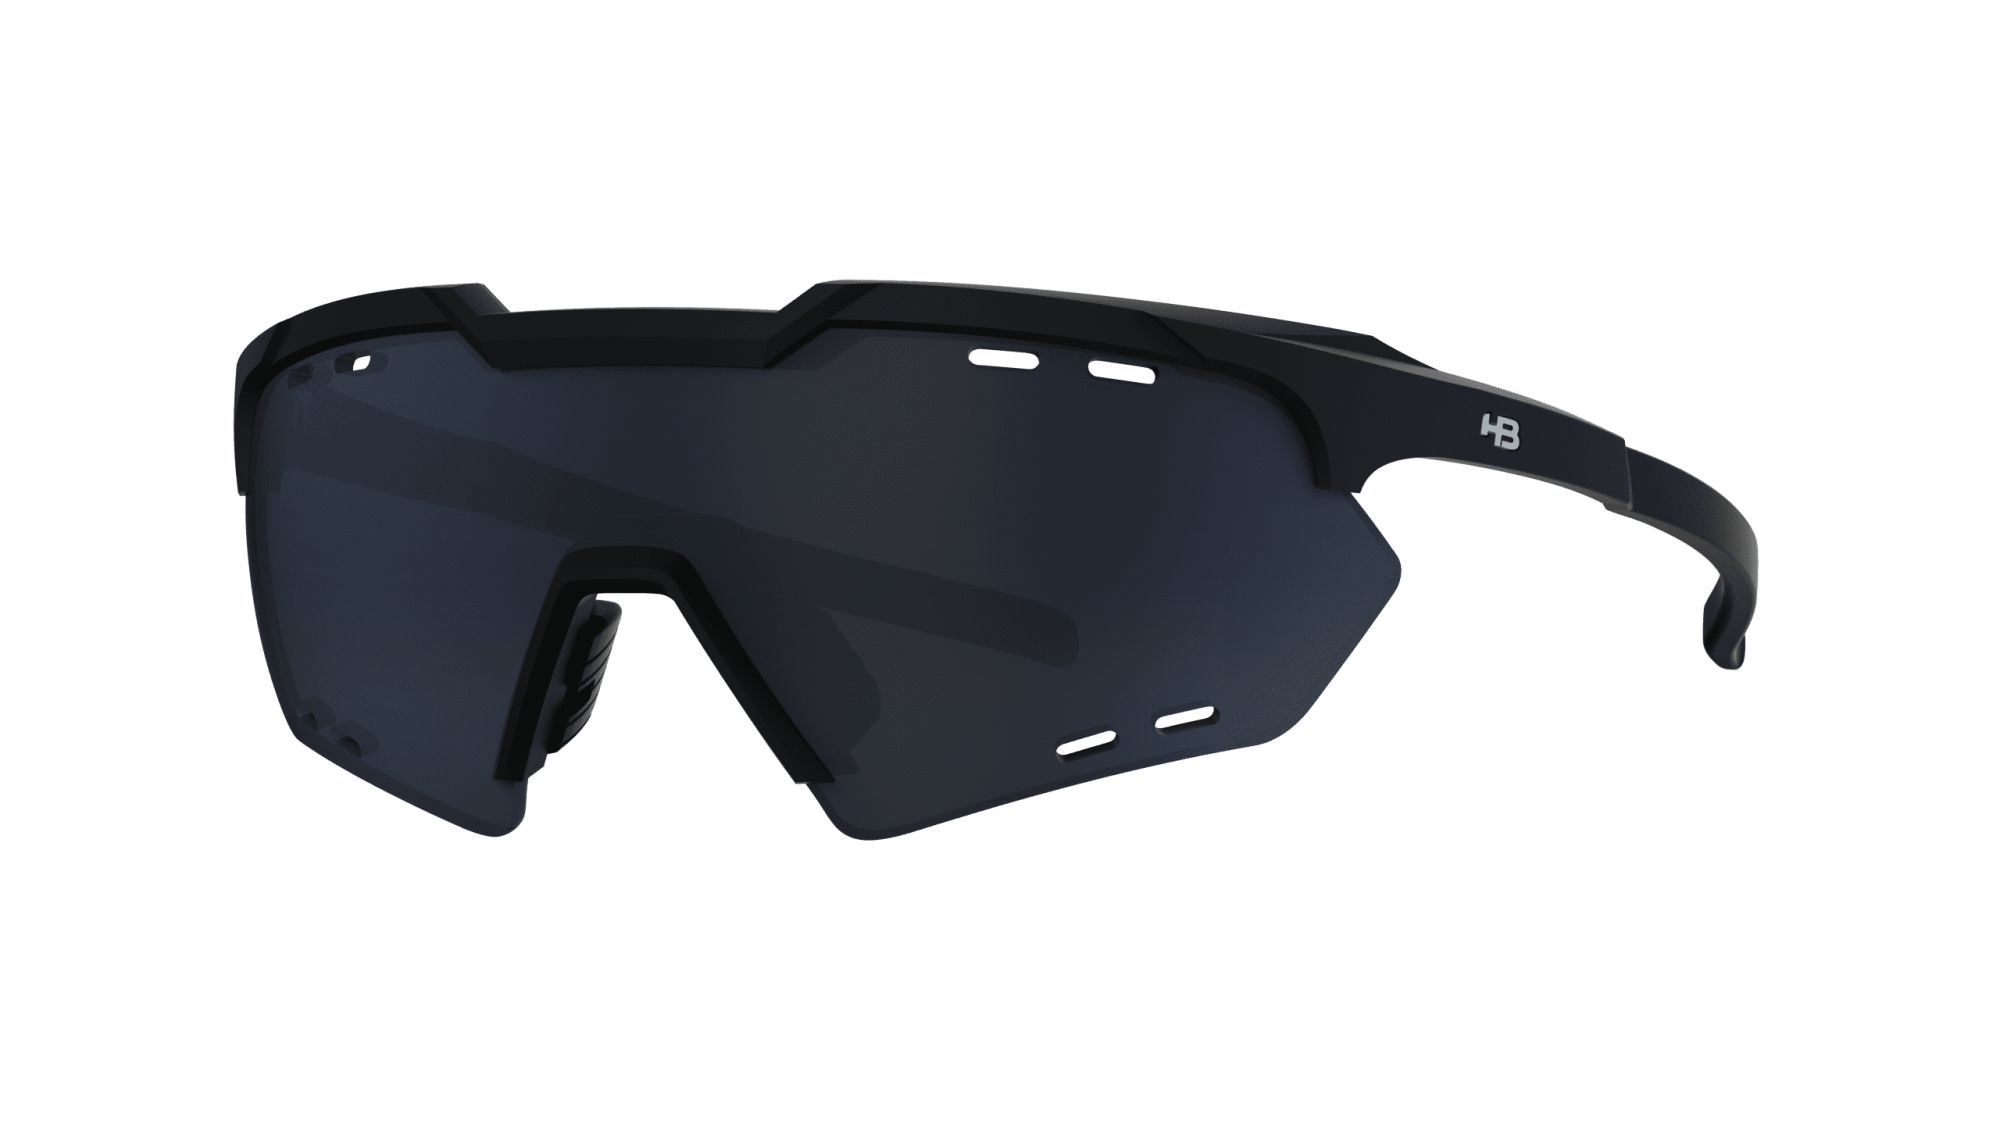 Óculos HB Shield Compact Small Moutain Matte Black Gray